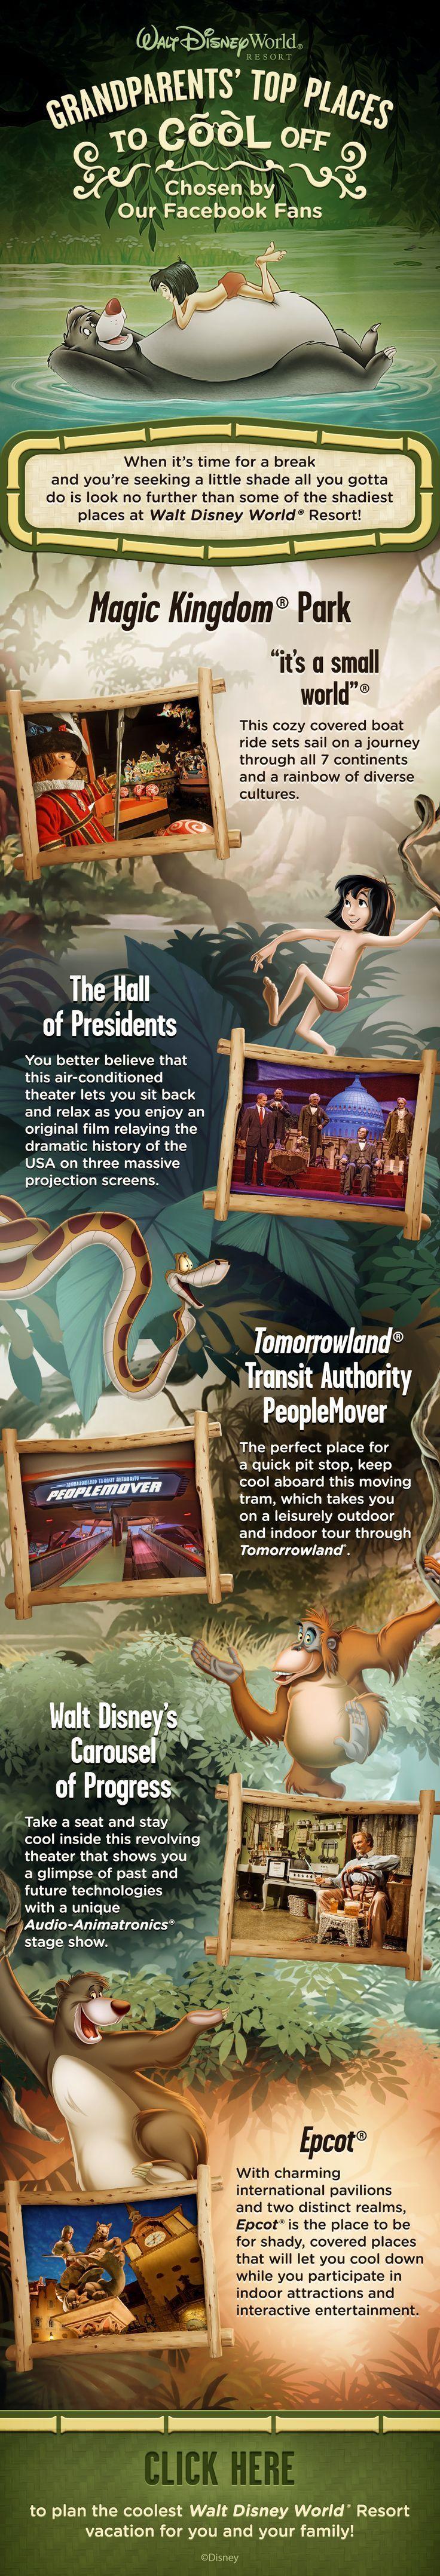 Walt Disney World Resort in Orlando, Florida - dezdemonexoticplaces.xyz